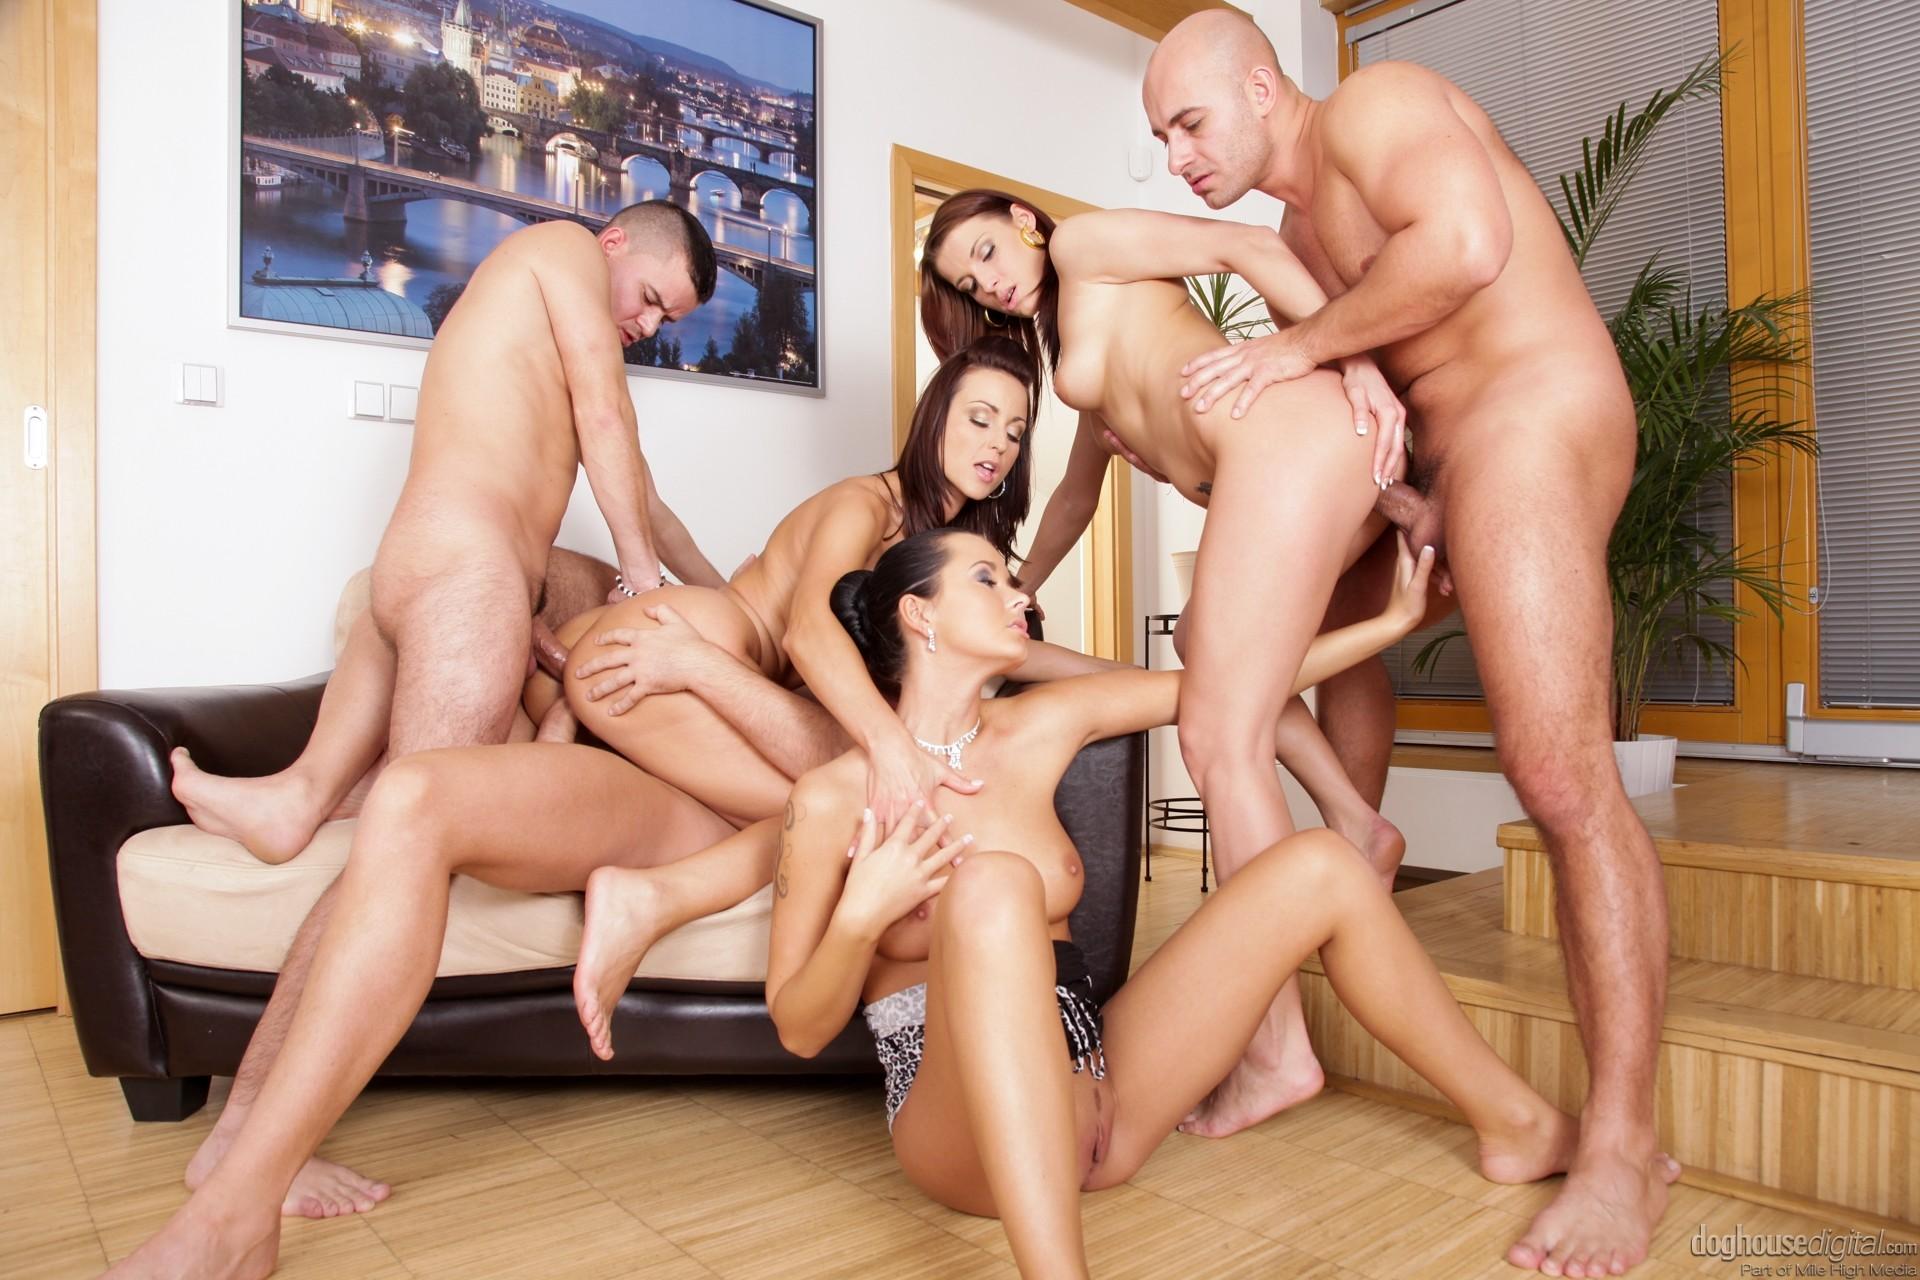 Gallery orgy photo